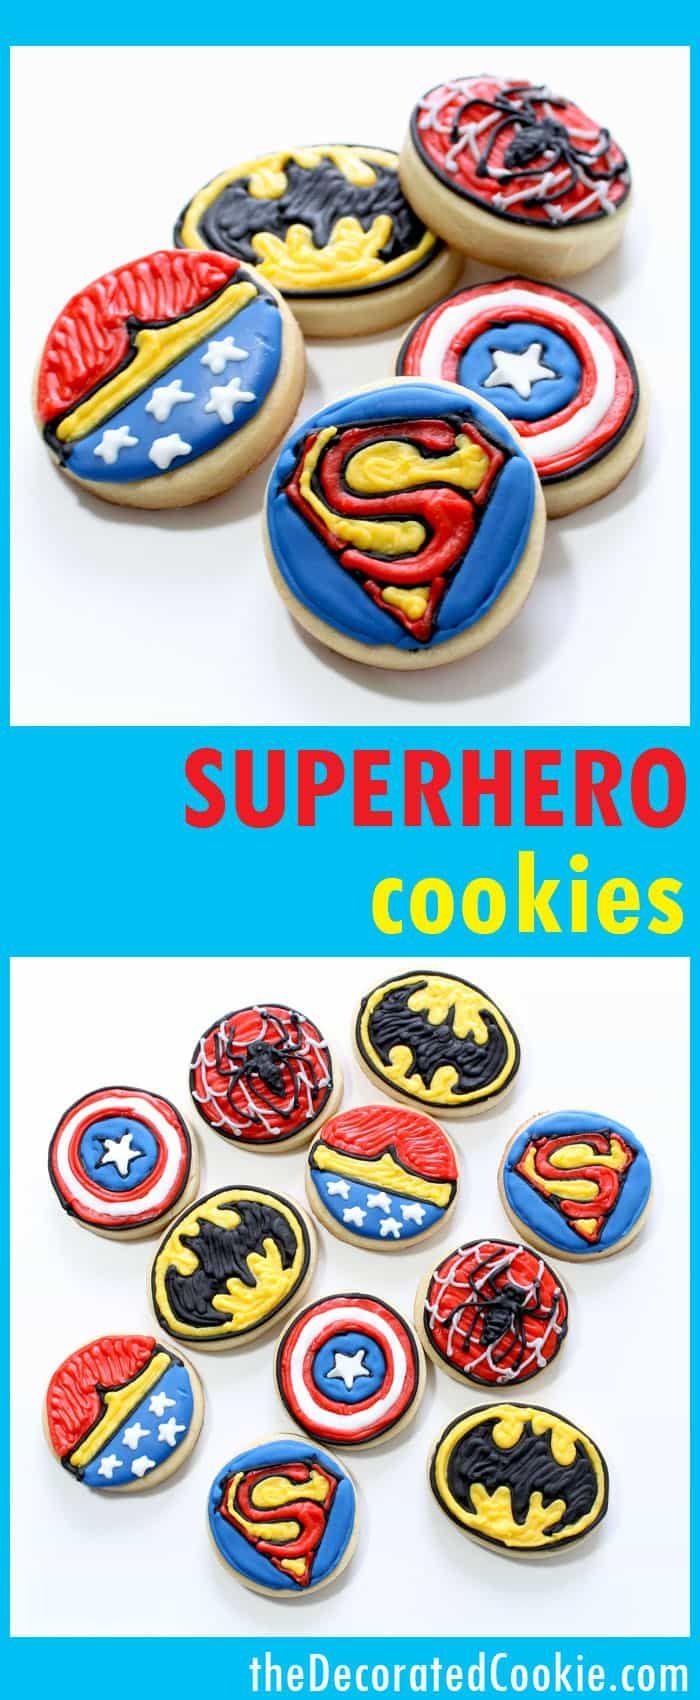 superhero cookies -- fun decorated cookies for a superhero party -- Wonder Woman, Spider-Man, Bat-Man, Captain America